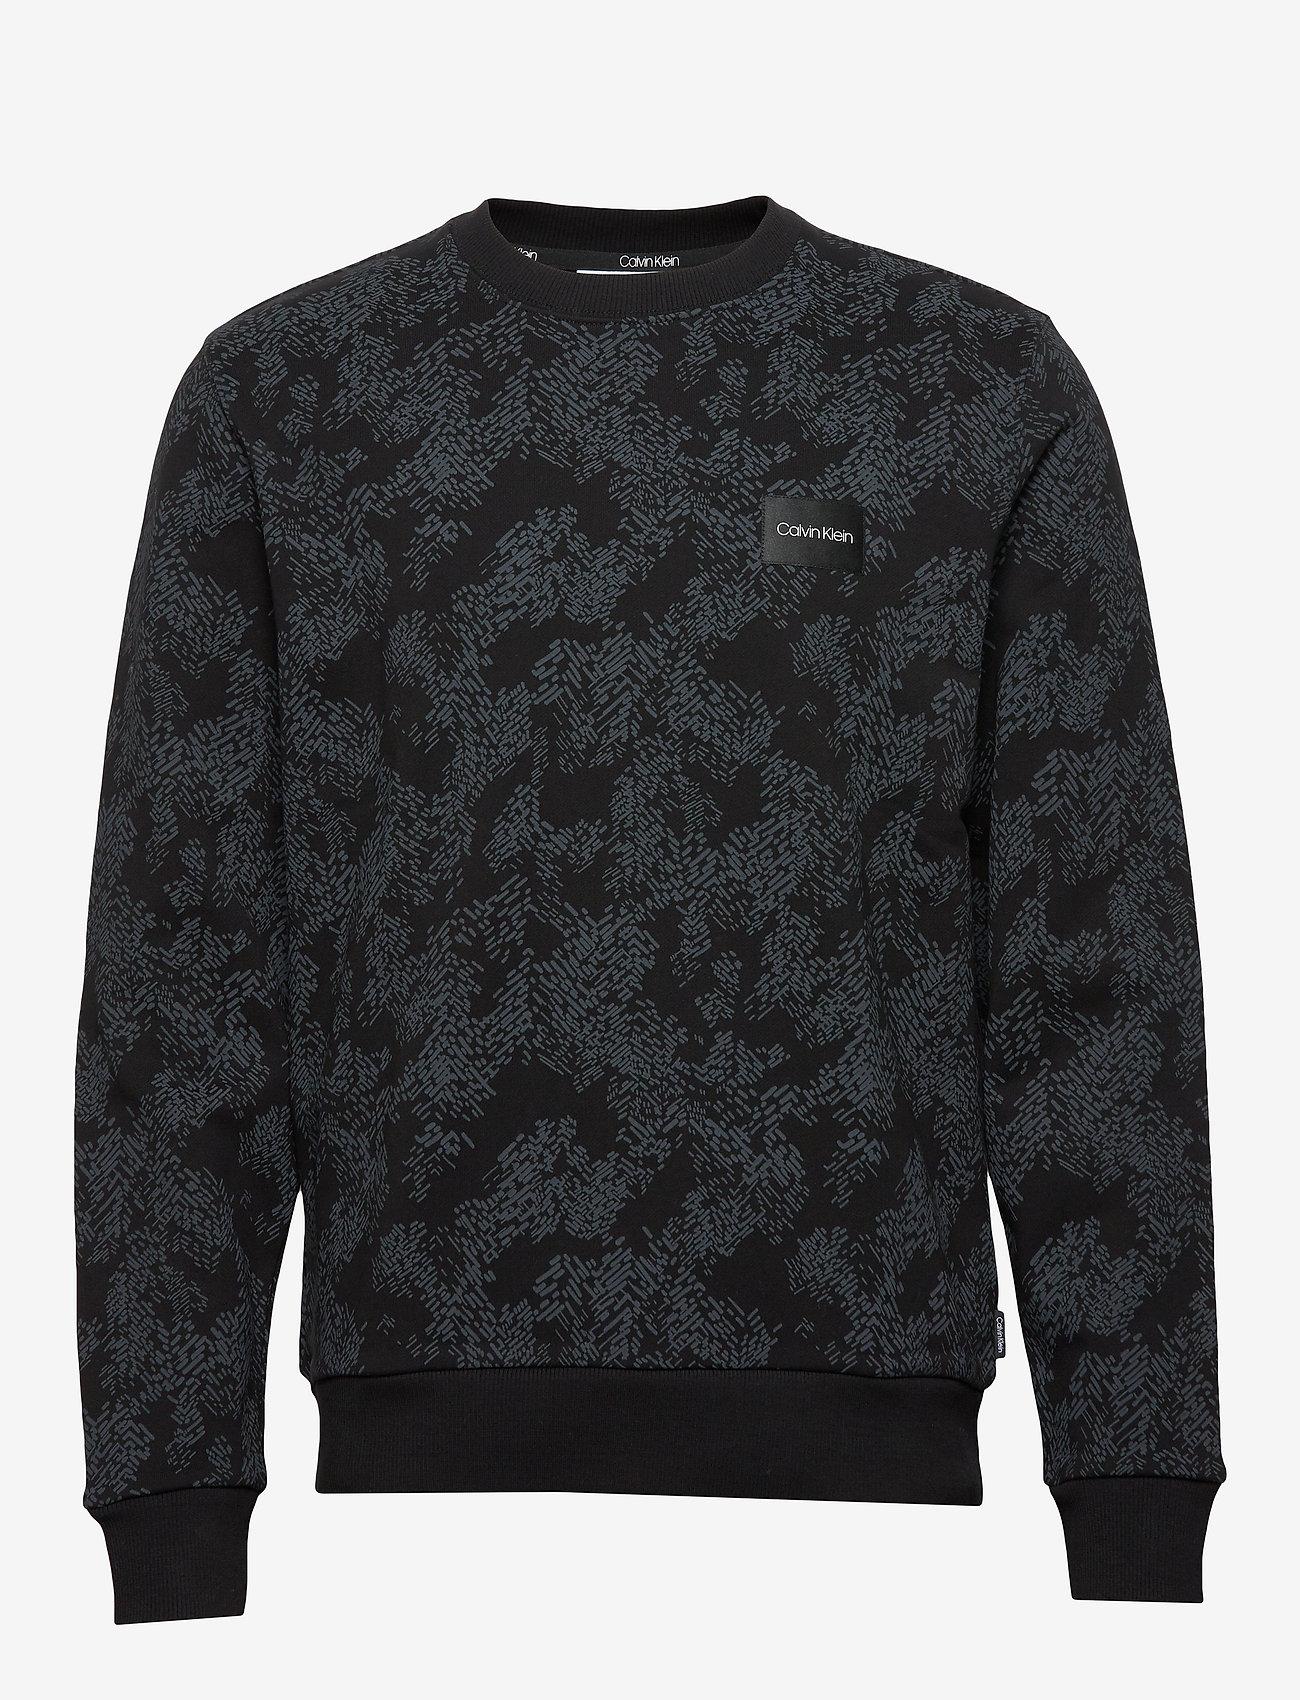 Calvin Klein Allover Printed Sweatshirt - Sweatshirts Black